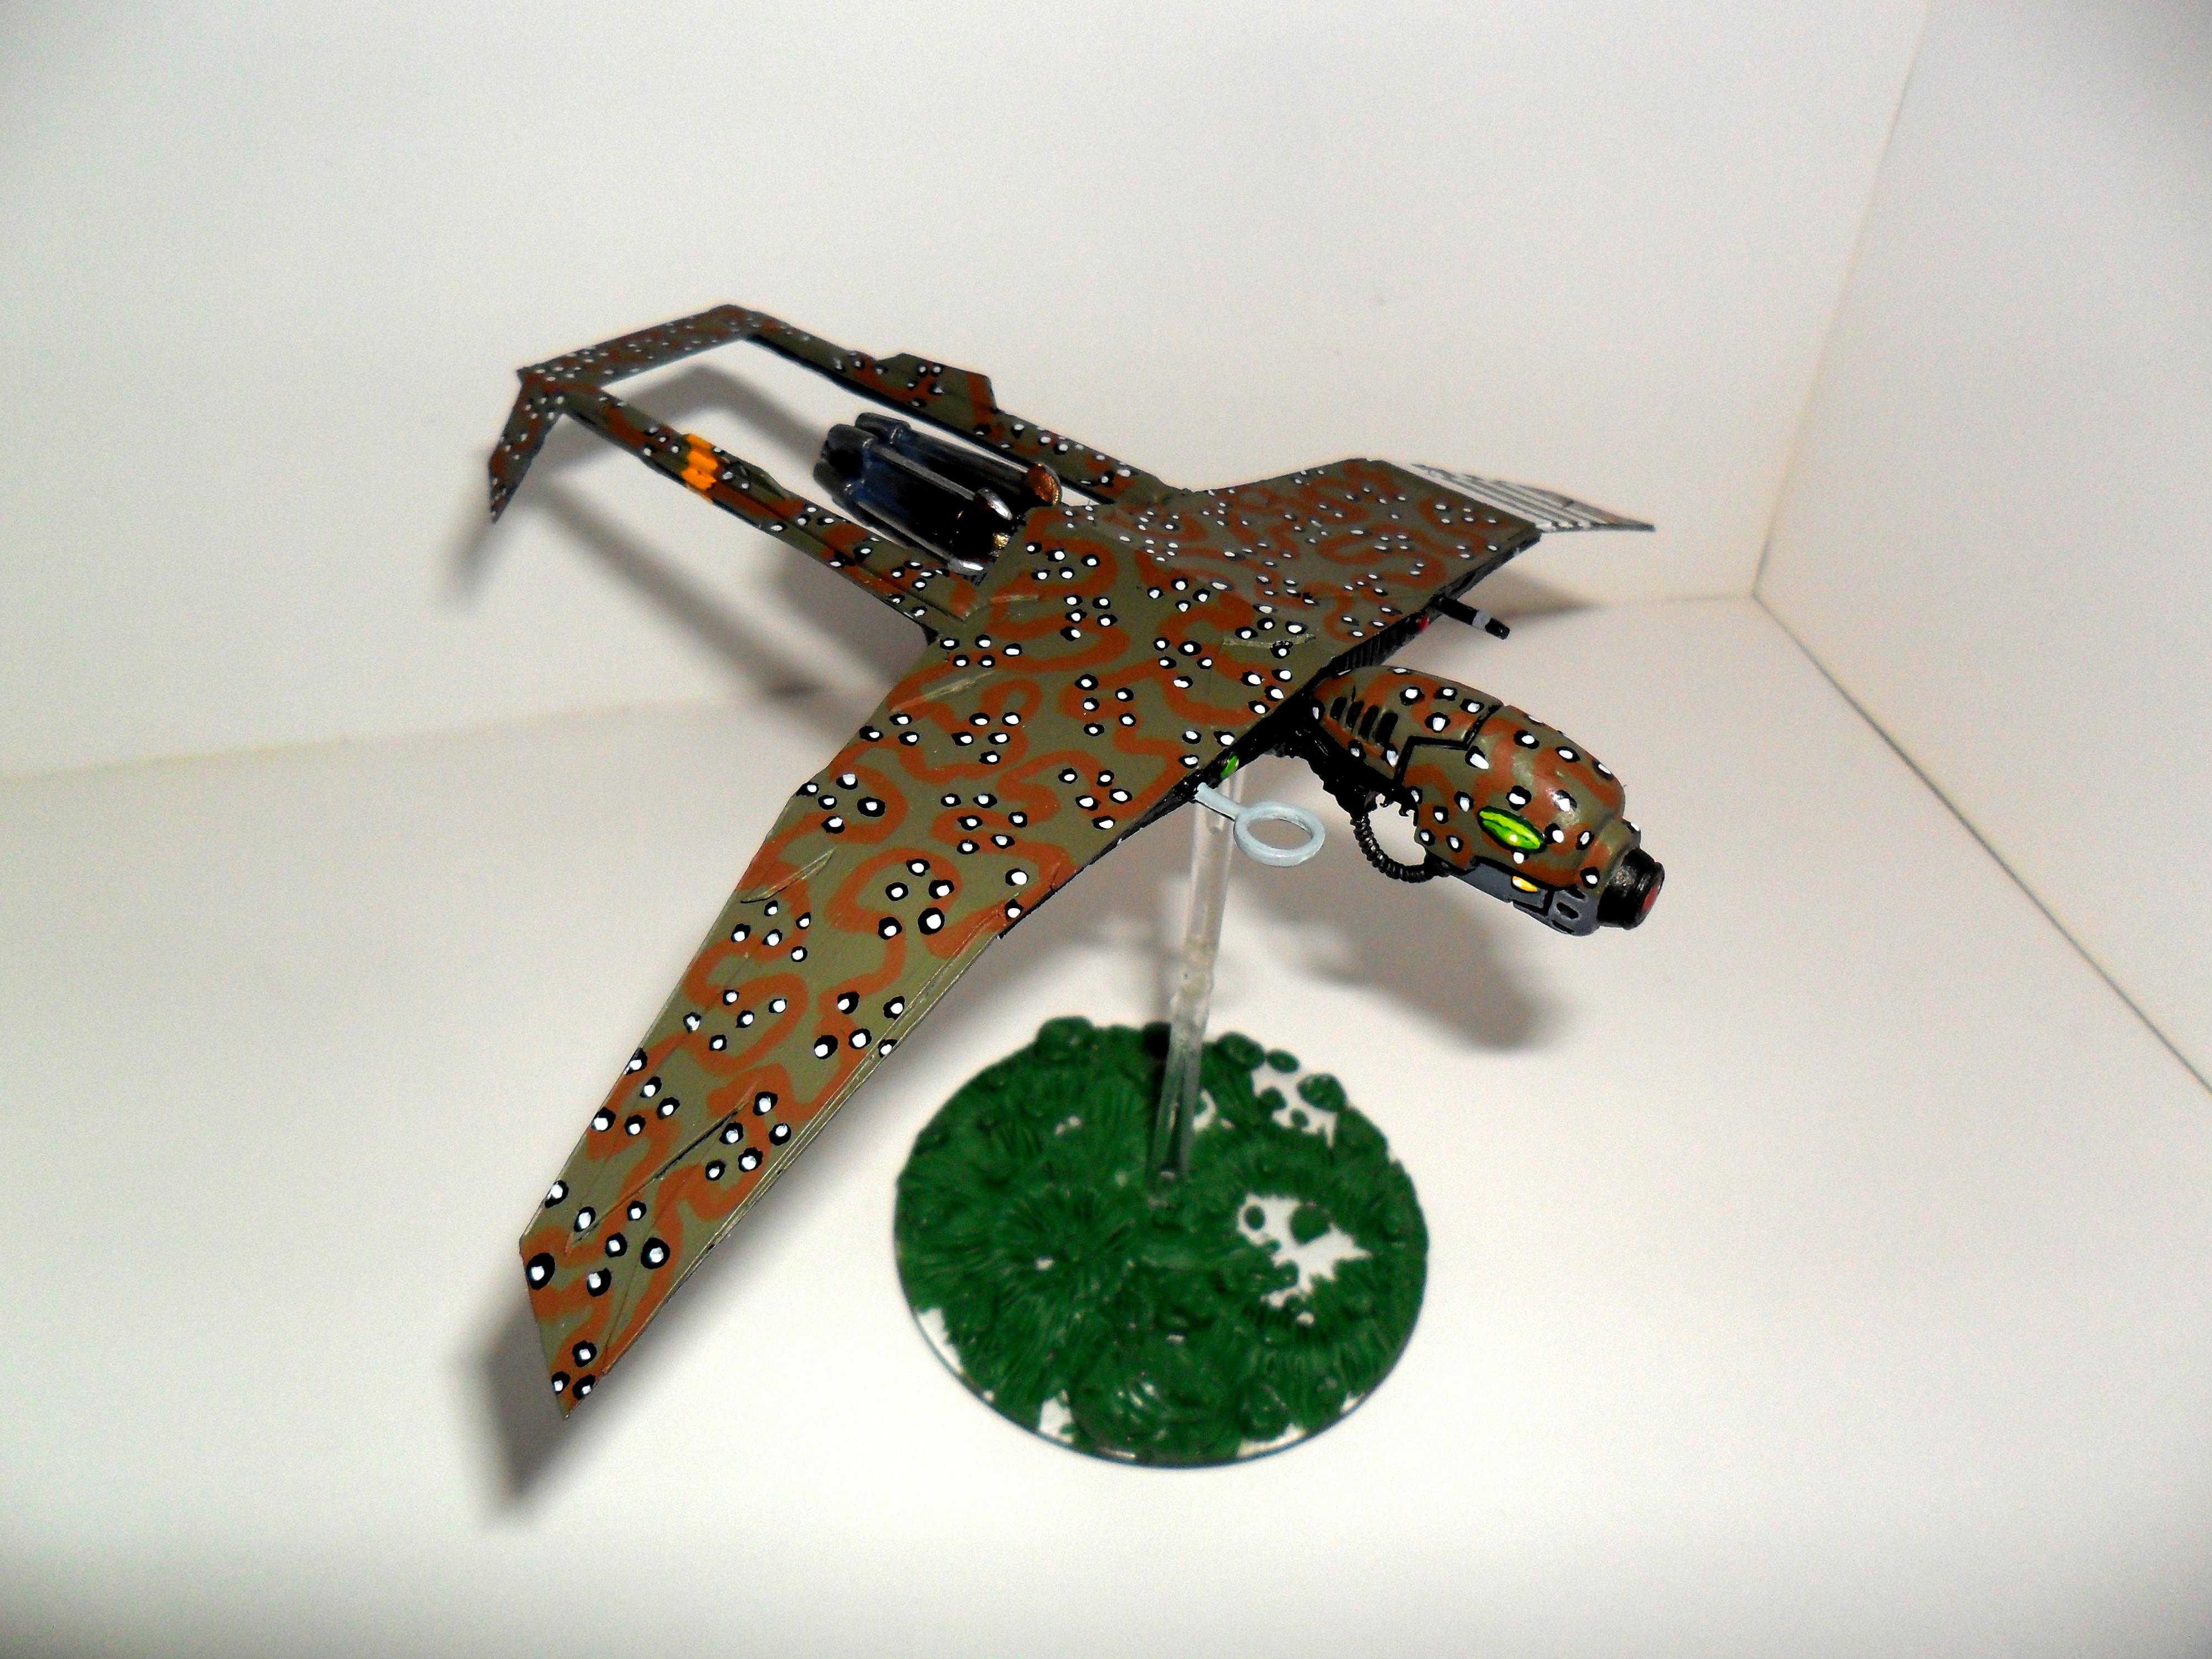 Drone, Flyer, Imperial Guard, Predator